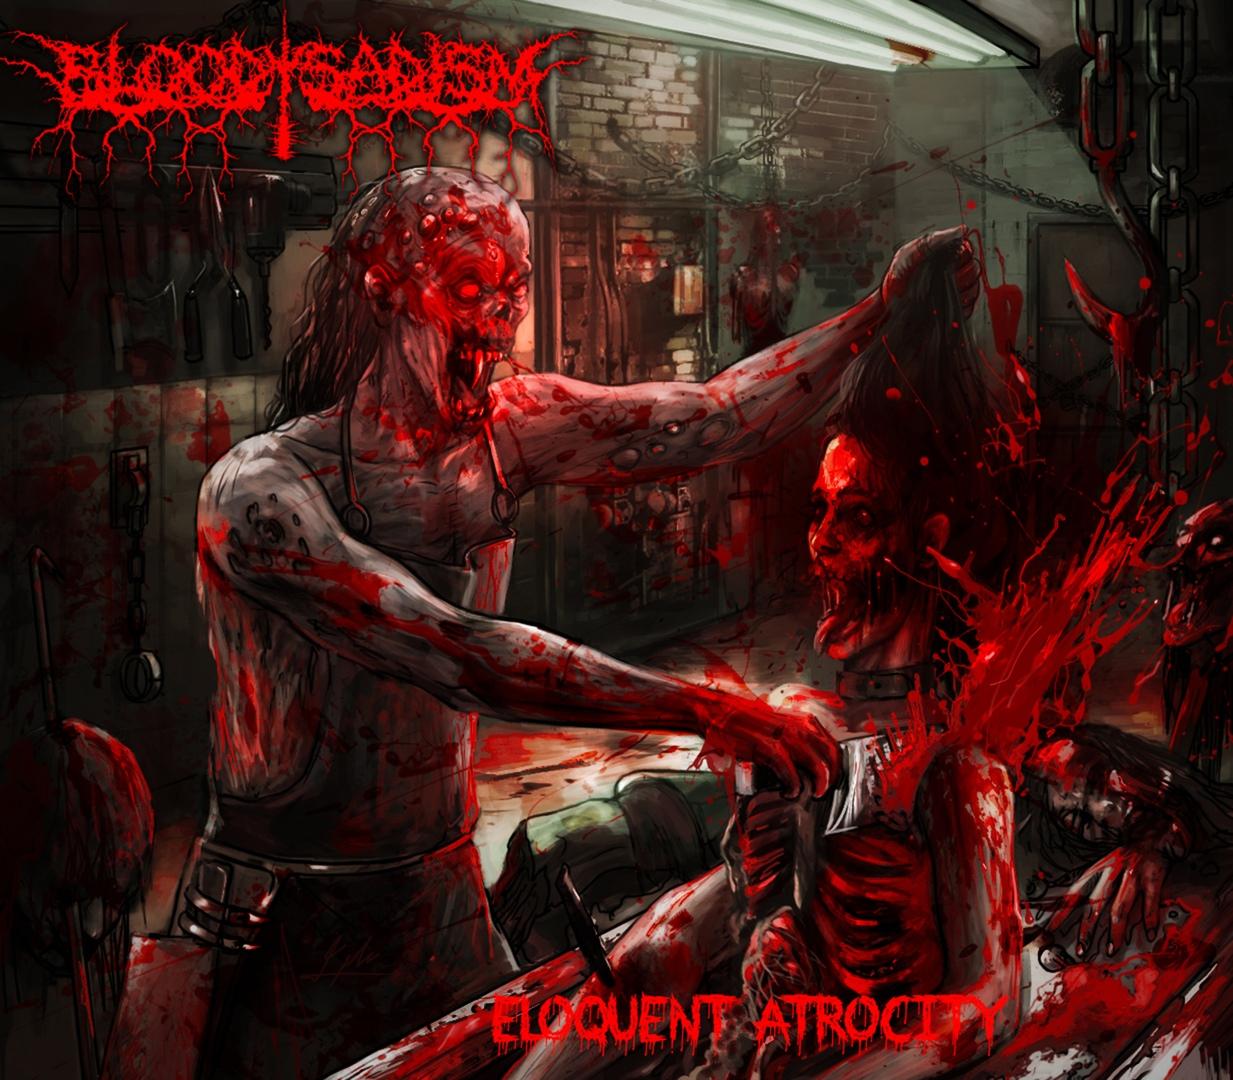 Bloody Sadism - Eloquent atrocity